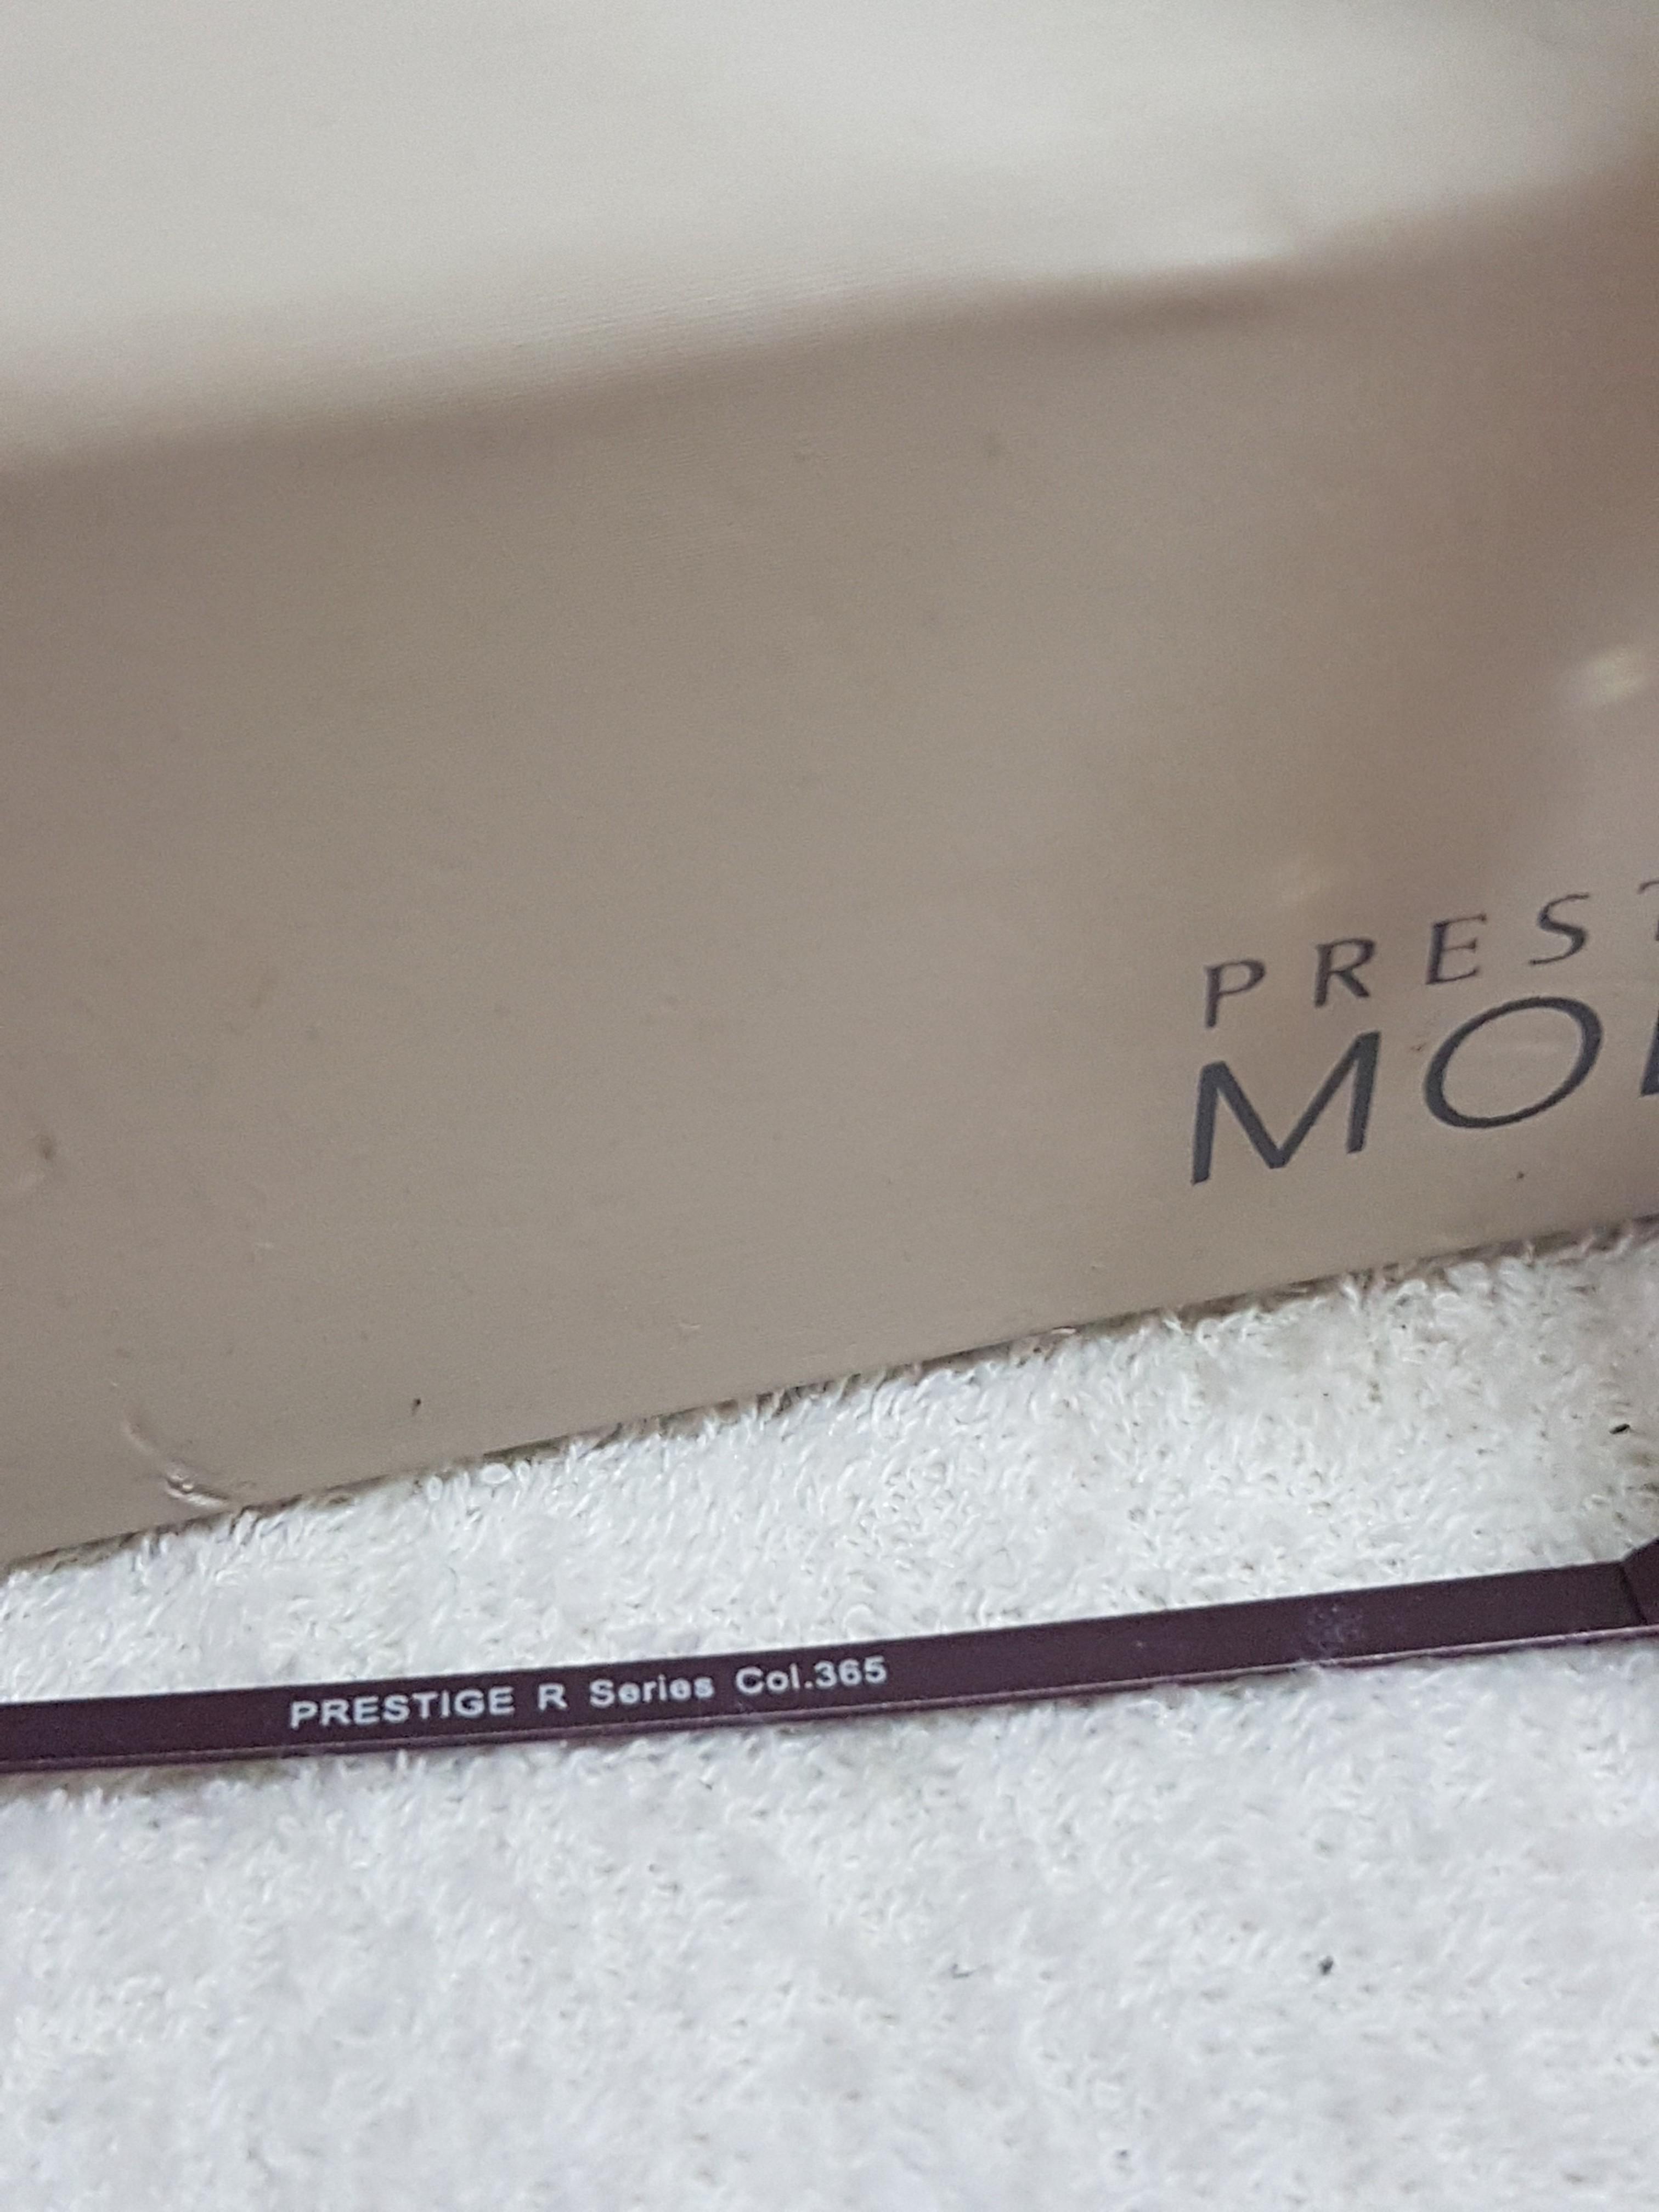 Authentic Prestige Moda Ultra-light Titanium Rimless Eyeglasses / Eye Wear / Spectacles